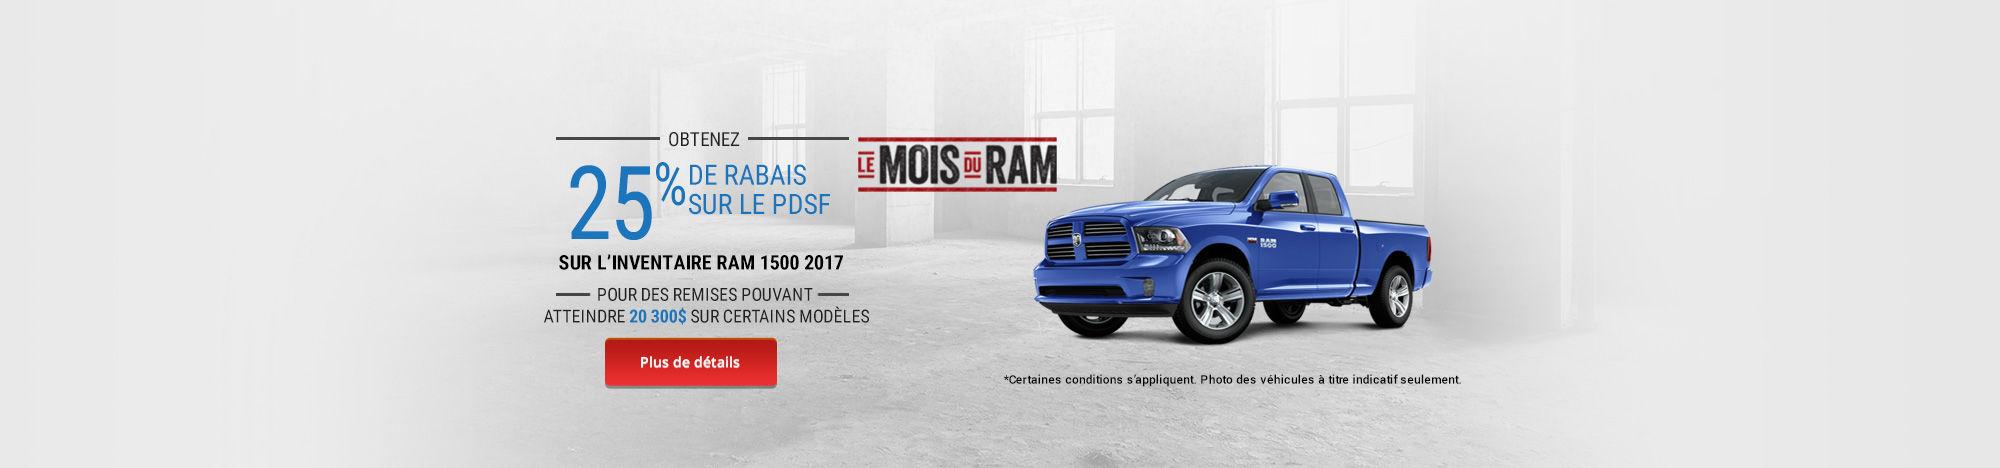 Le mois du RAM - RAM